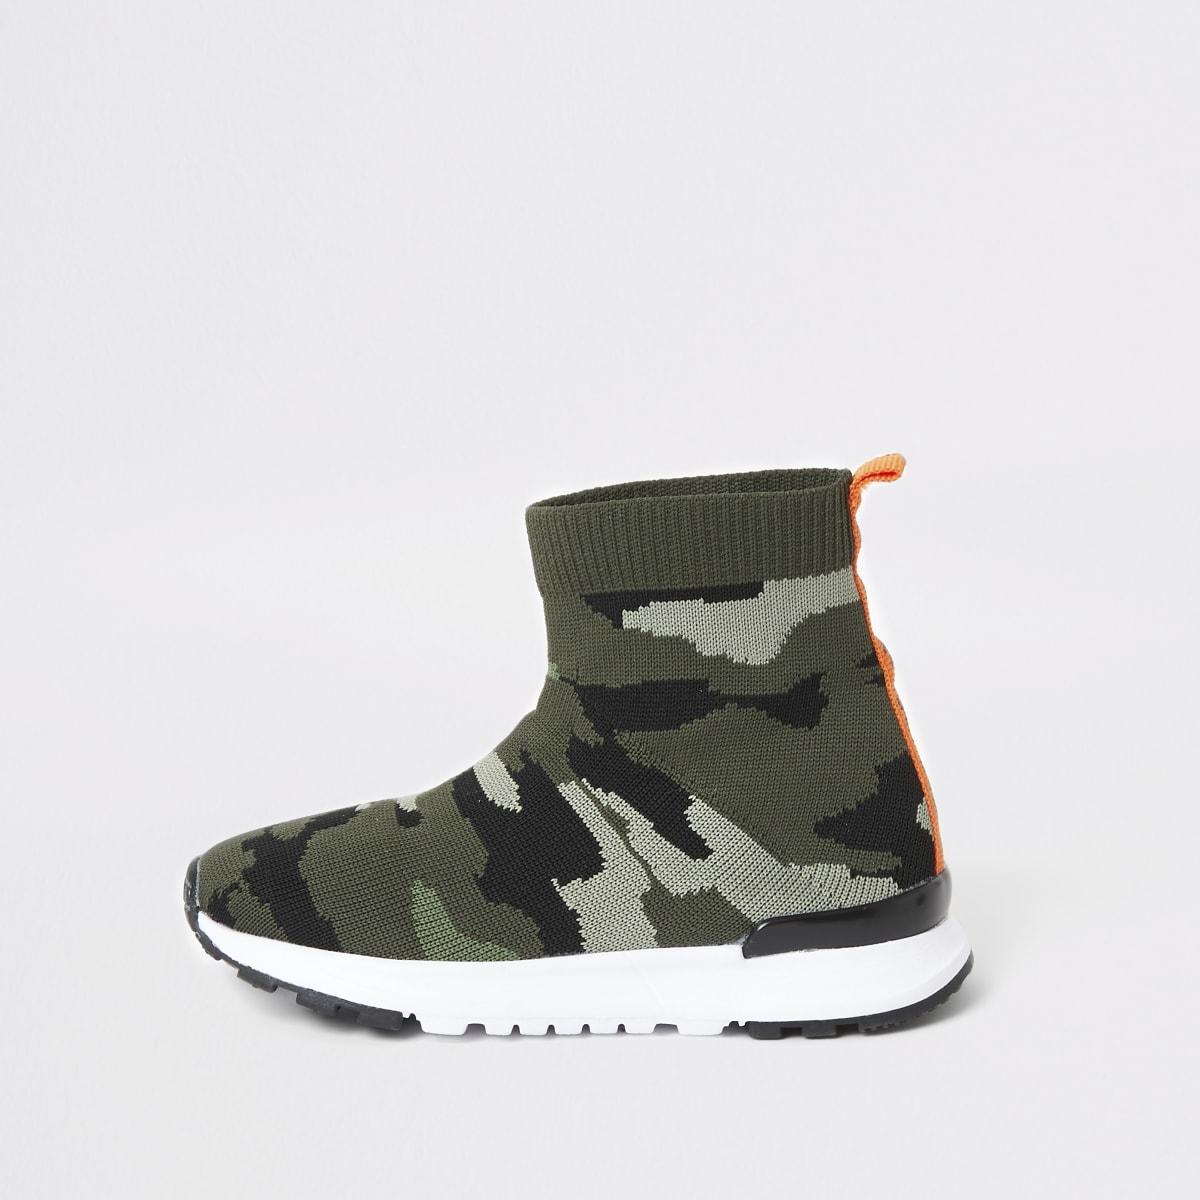 Baskets-chaussettes hautes kaki camouflageMini garçon